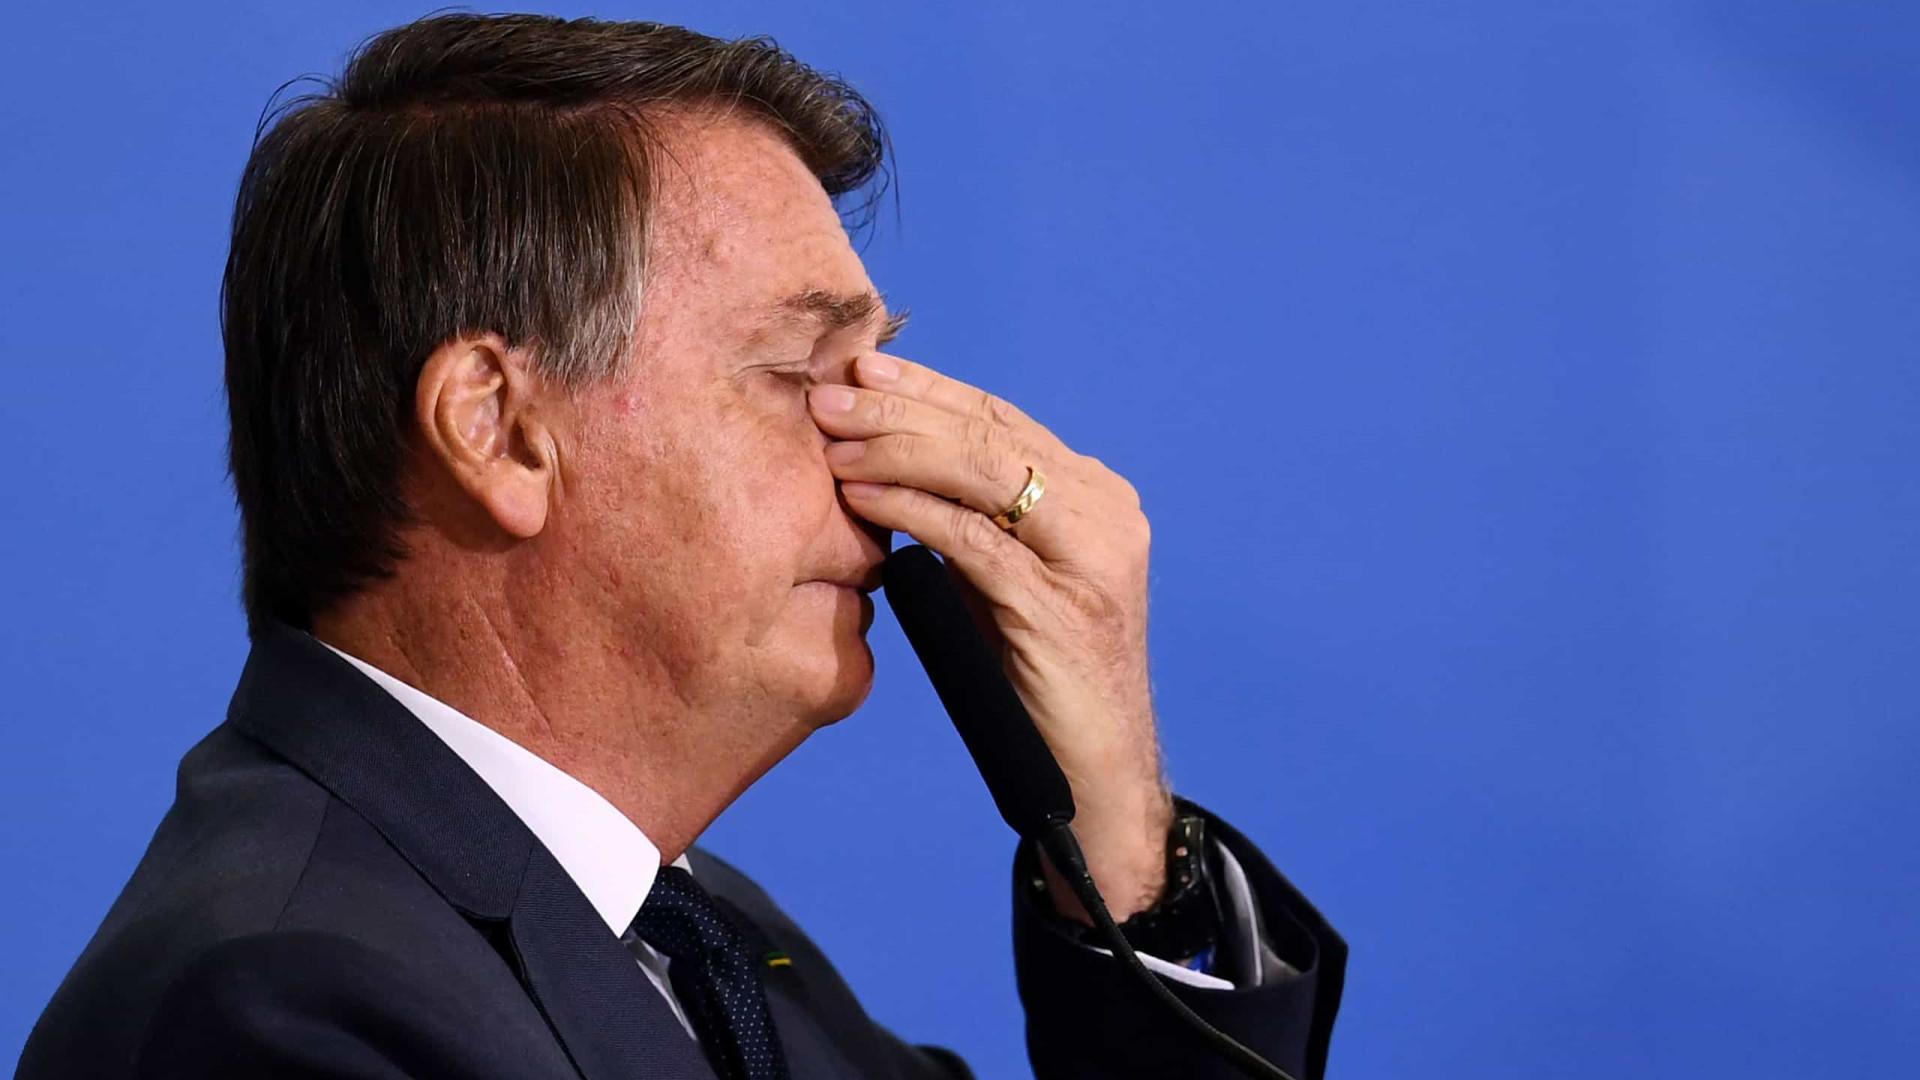 Inflação alta afasta jovens de Bolsonaro, mostra Ipec